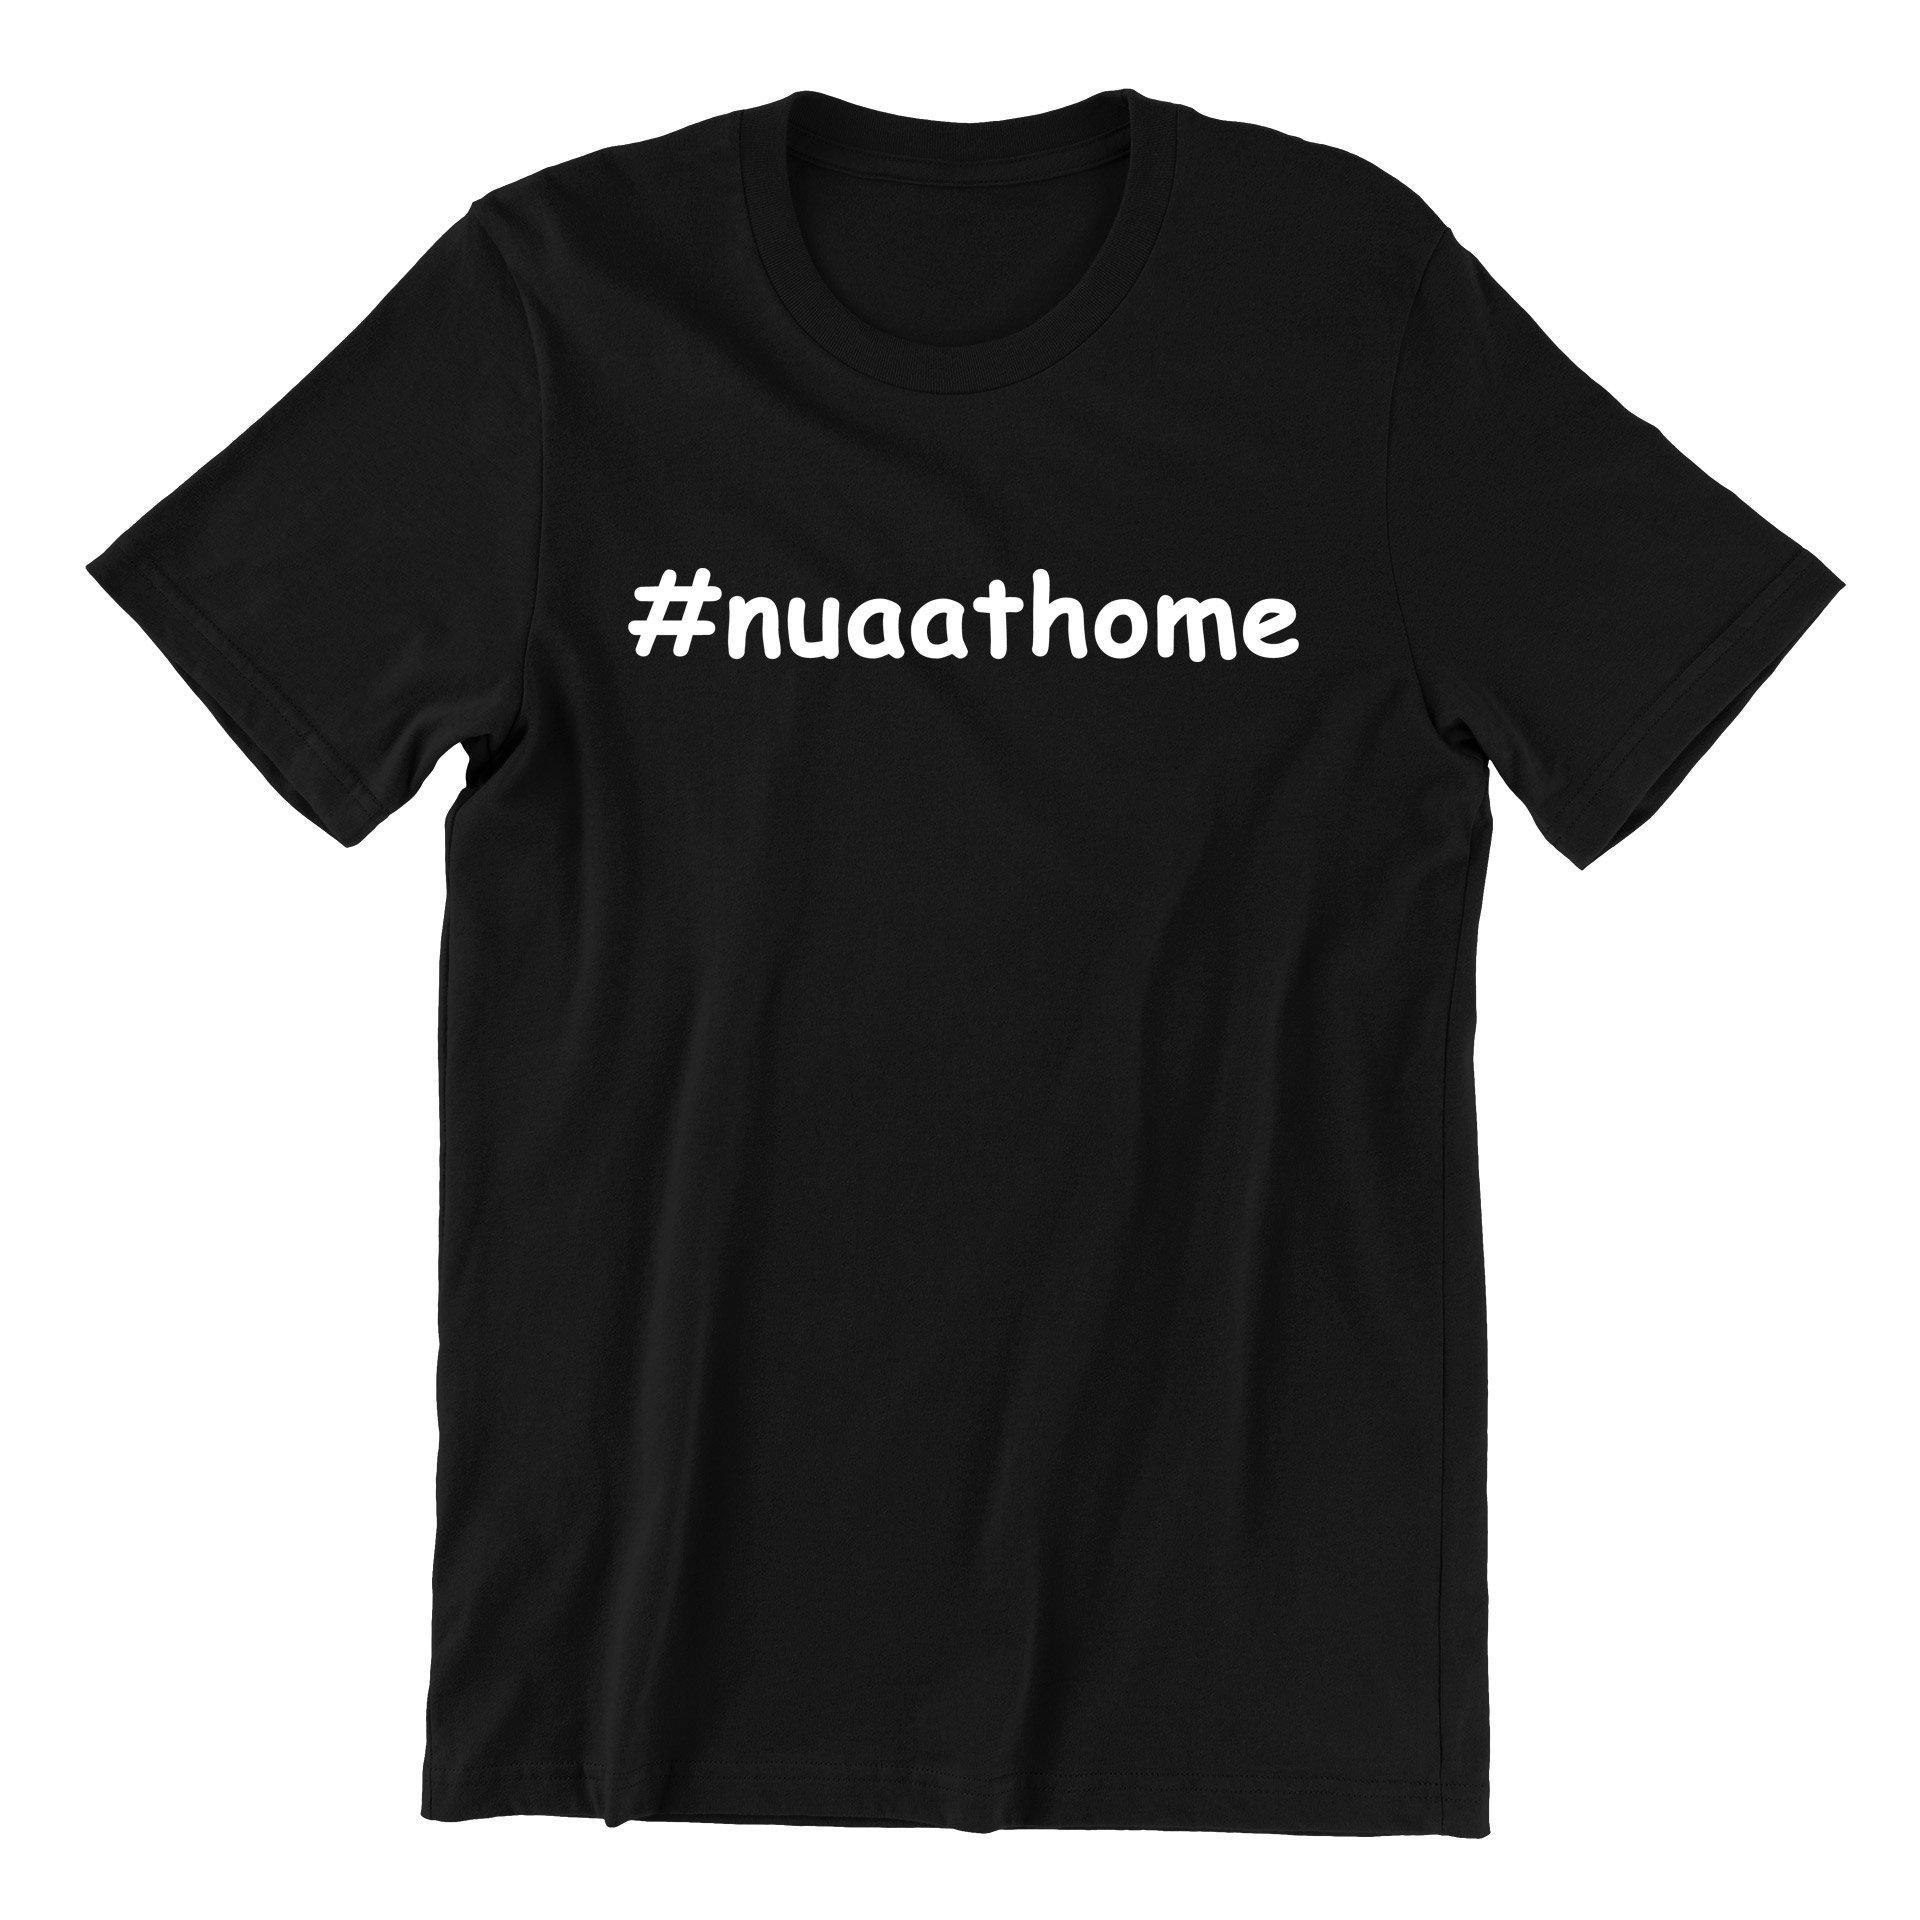 Nua at home Short Sleeve T-shirt